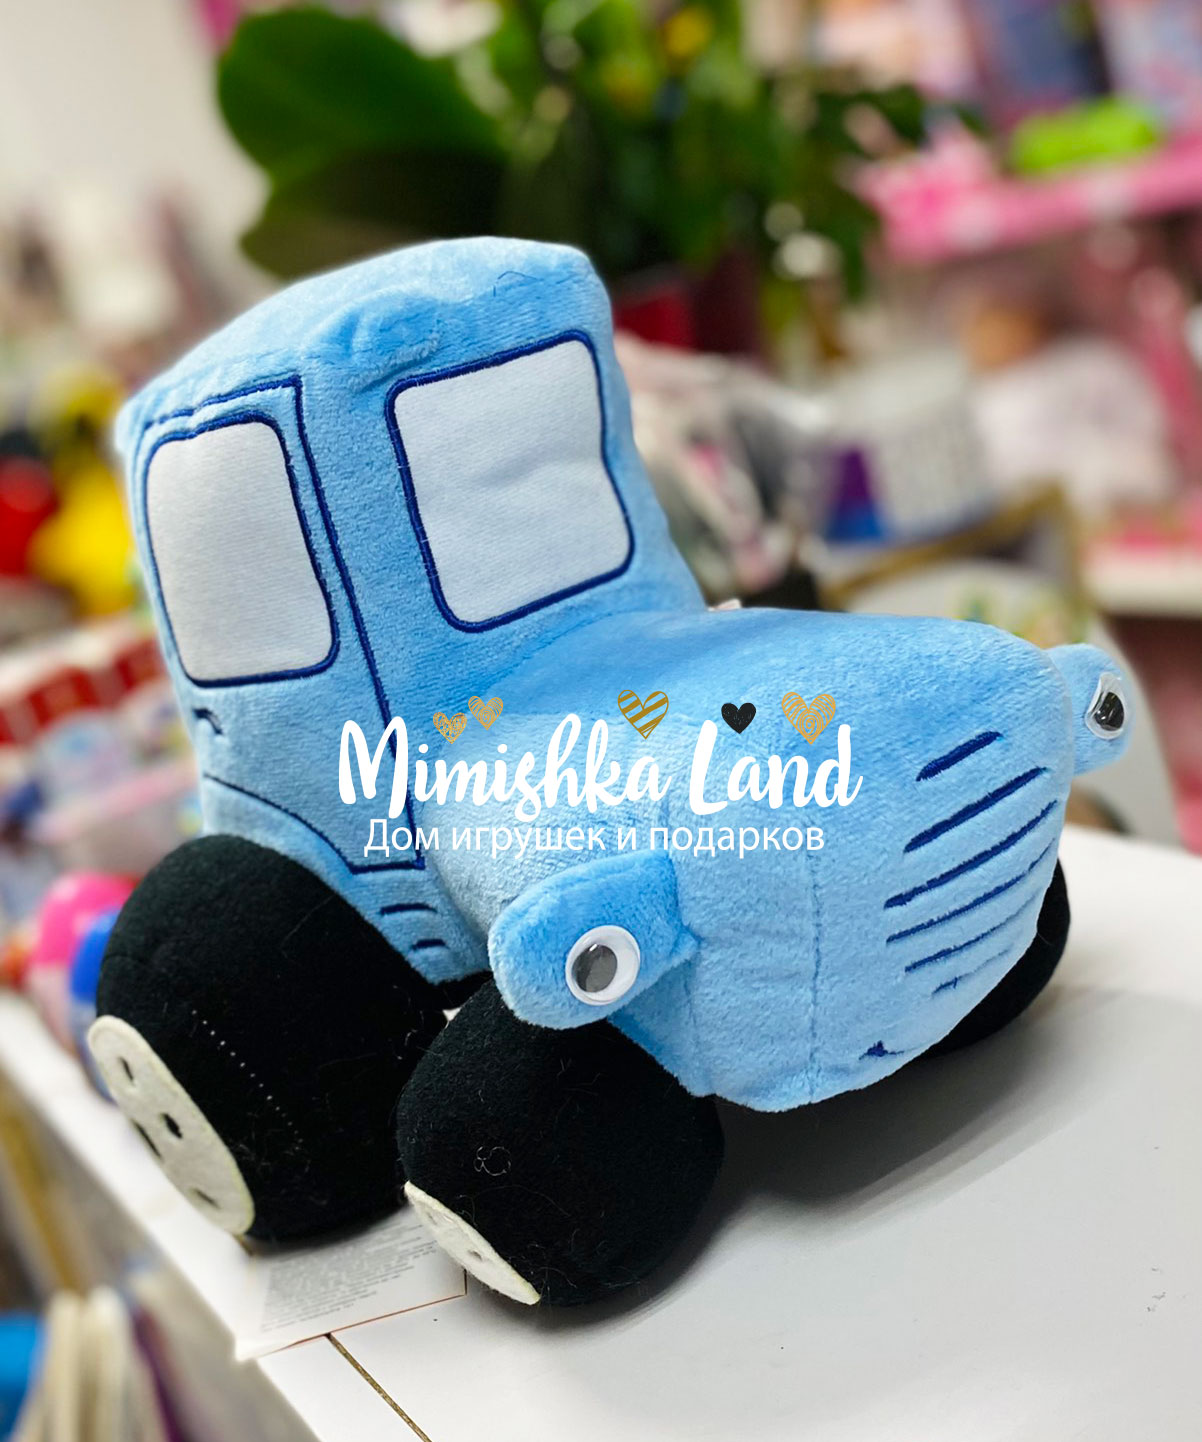 Витрина магазина: Мягкая игрушка Синий трактор (аналог) 25 см